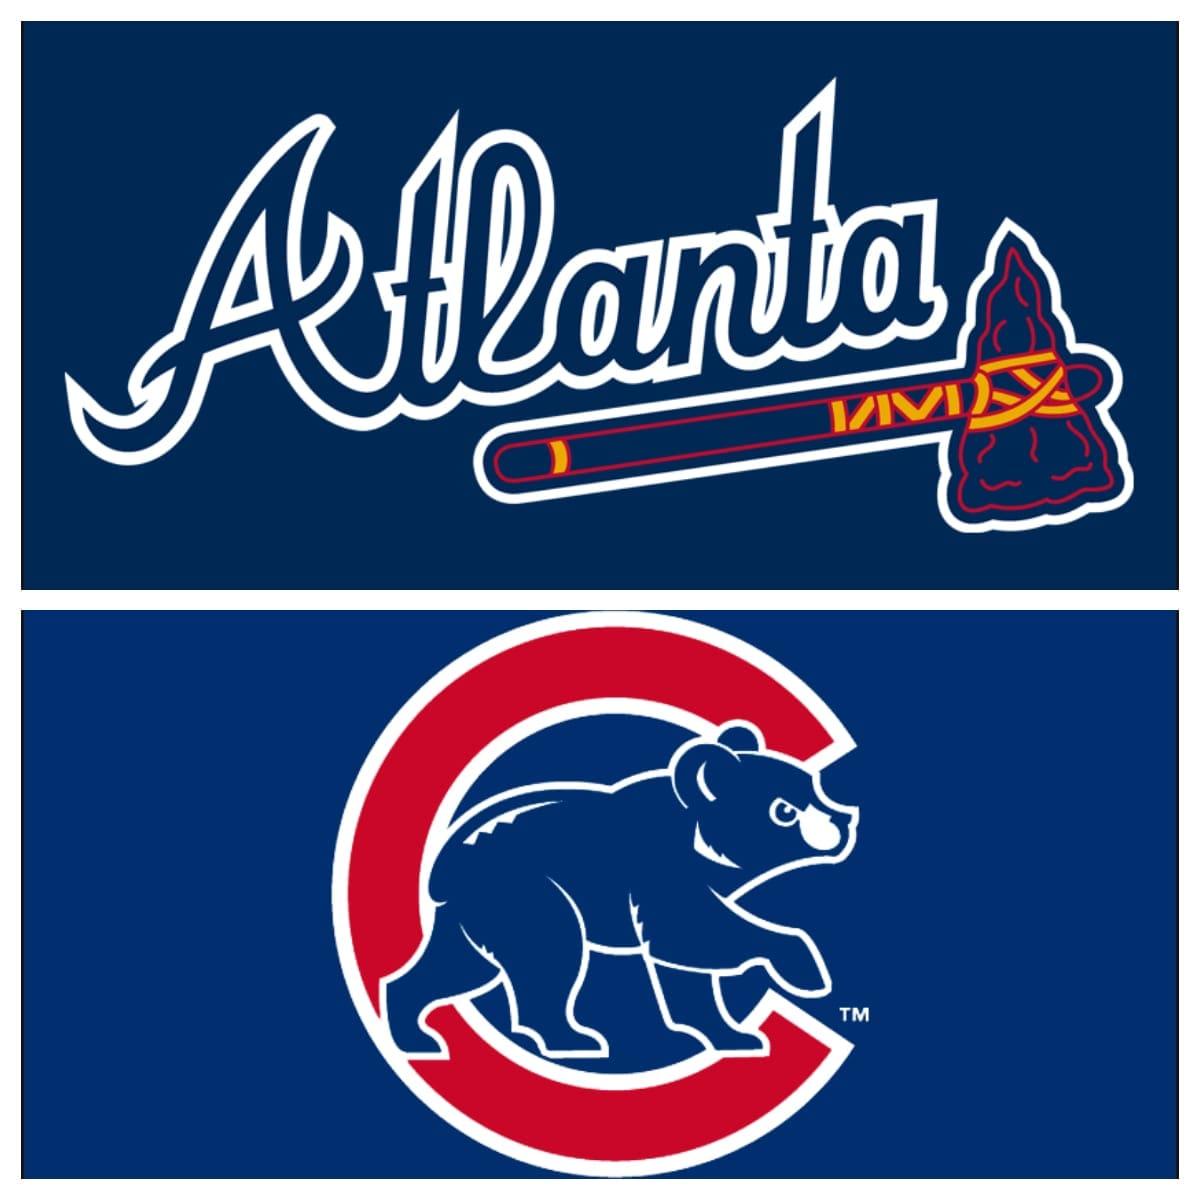 Atlanta Braves vs Chicago Cubs Stats